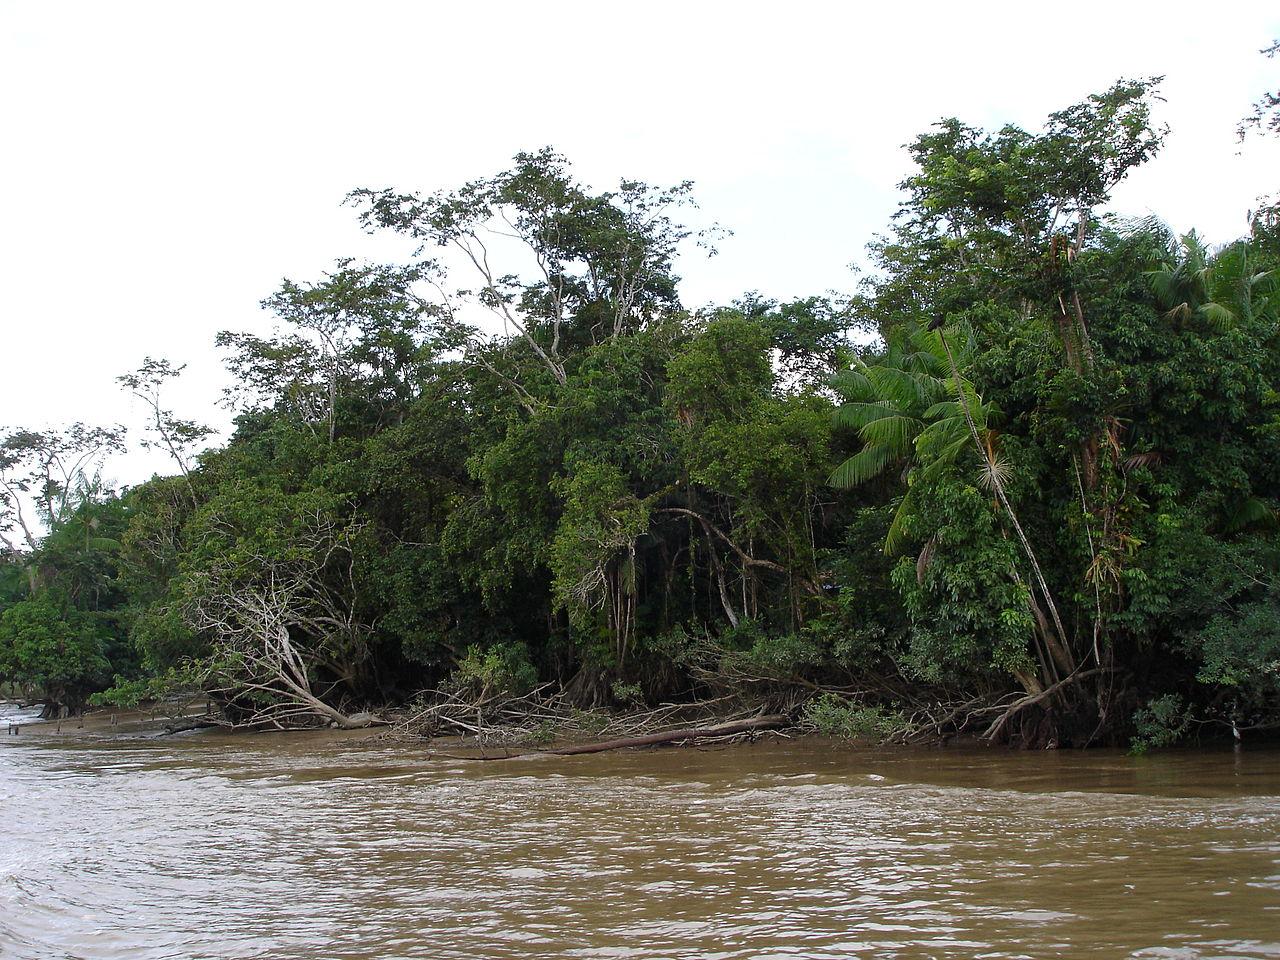 1280px-Amazon_river.jpg